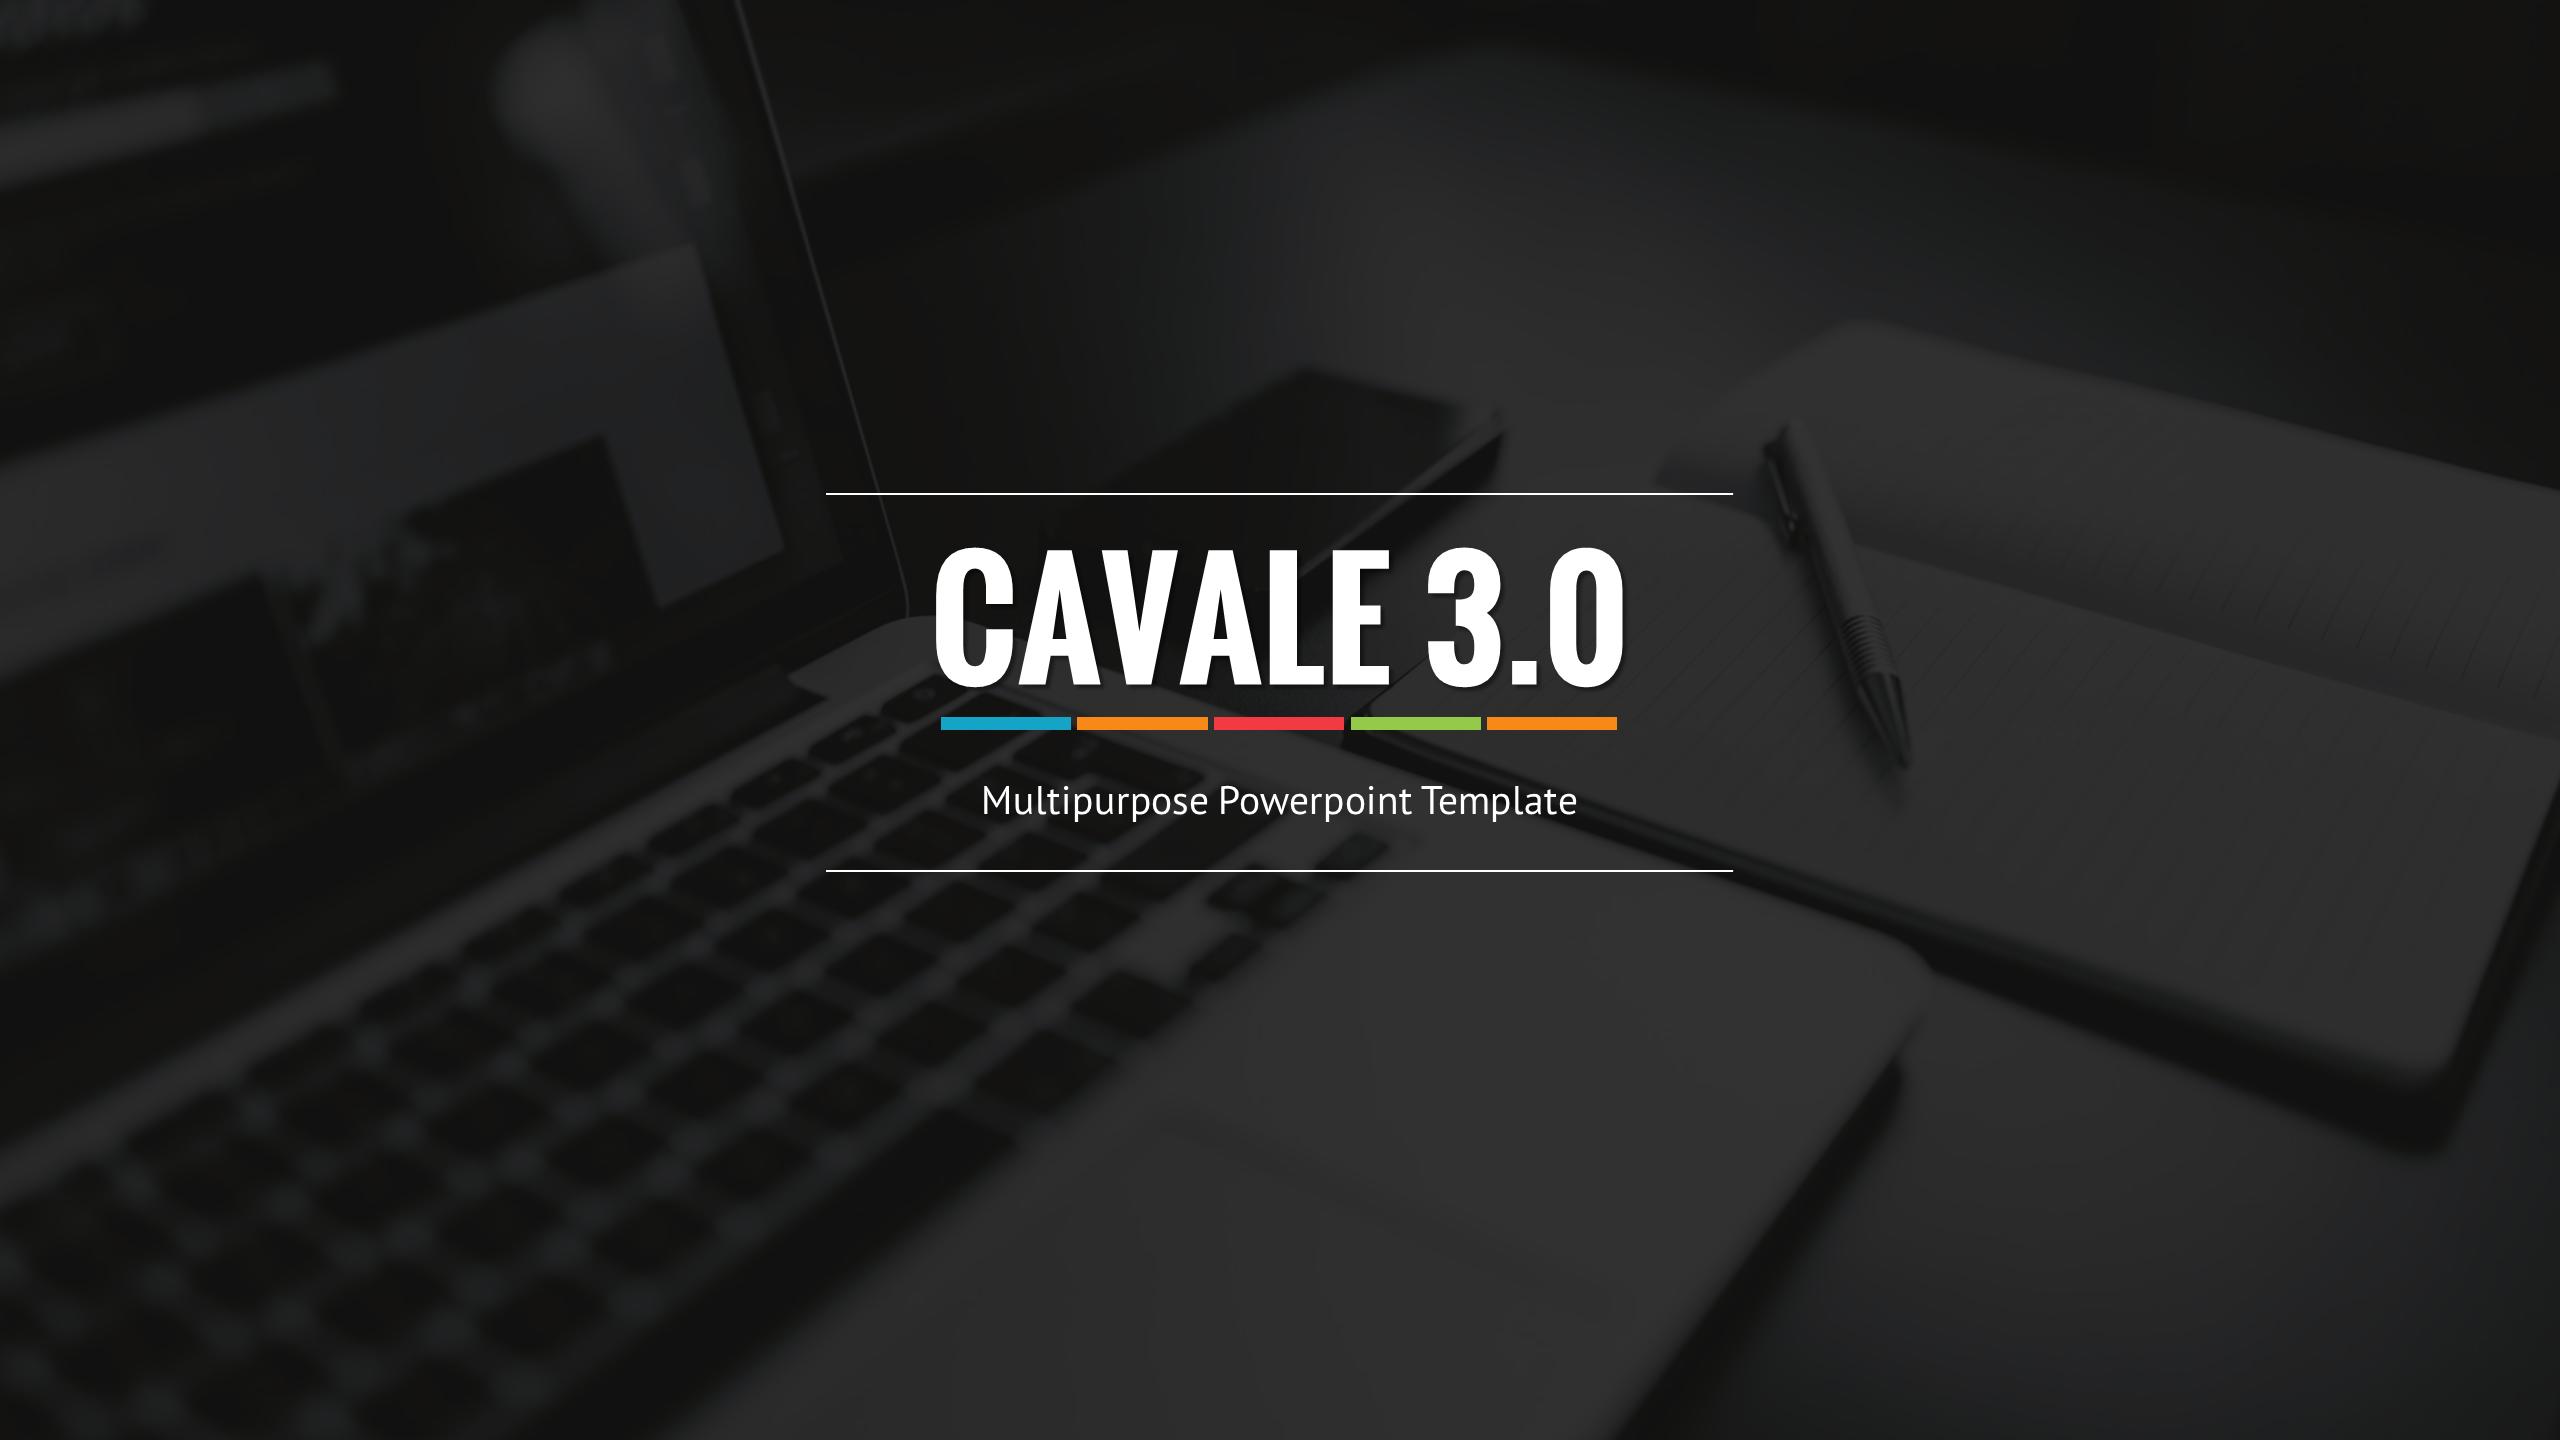 Cavale multipurpose powerpoint presentation template by m duarte business powerpoint templates slide 001 alramifo Images